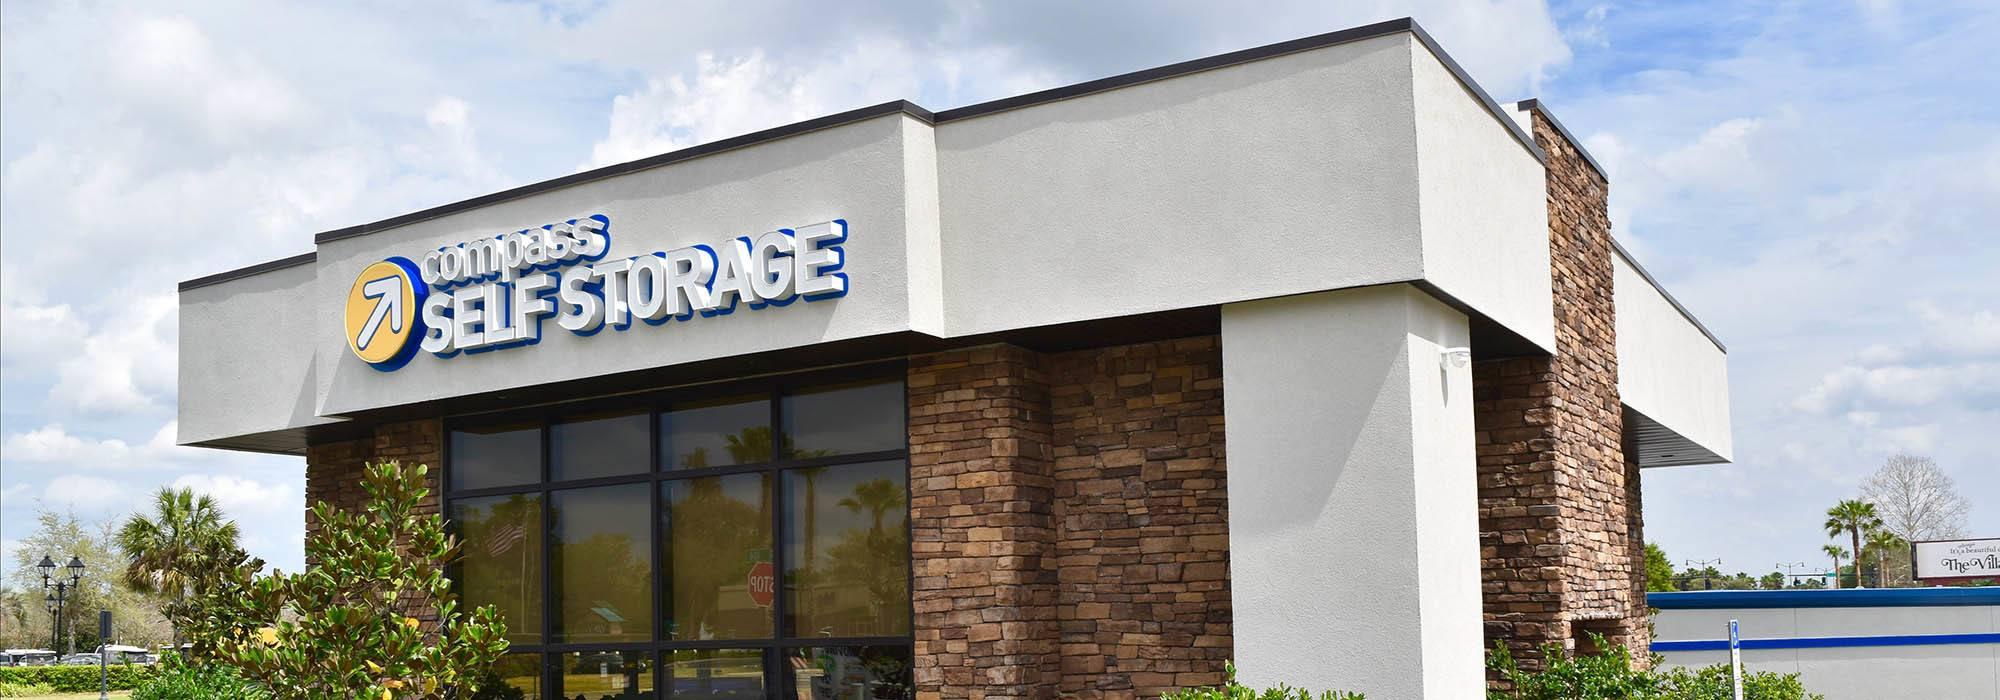 Self storage in Oxford FL